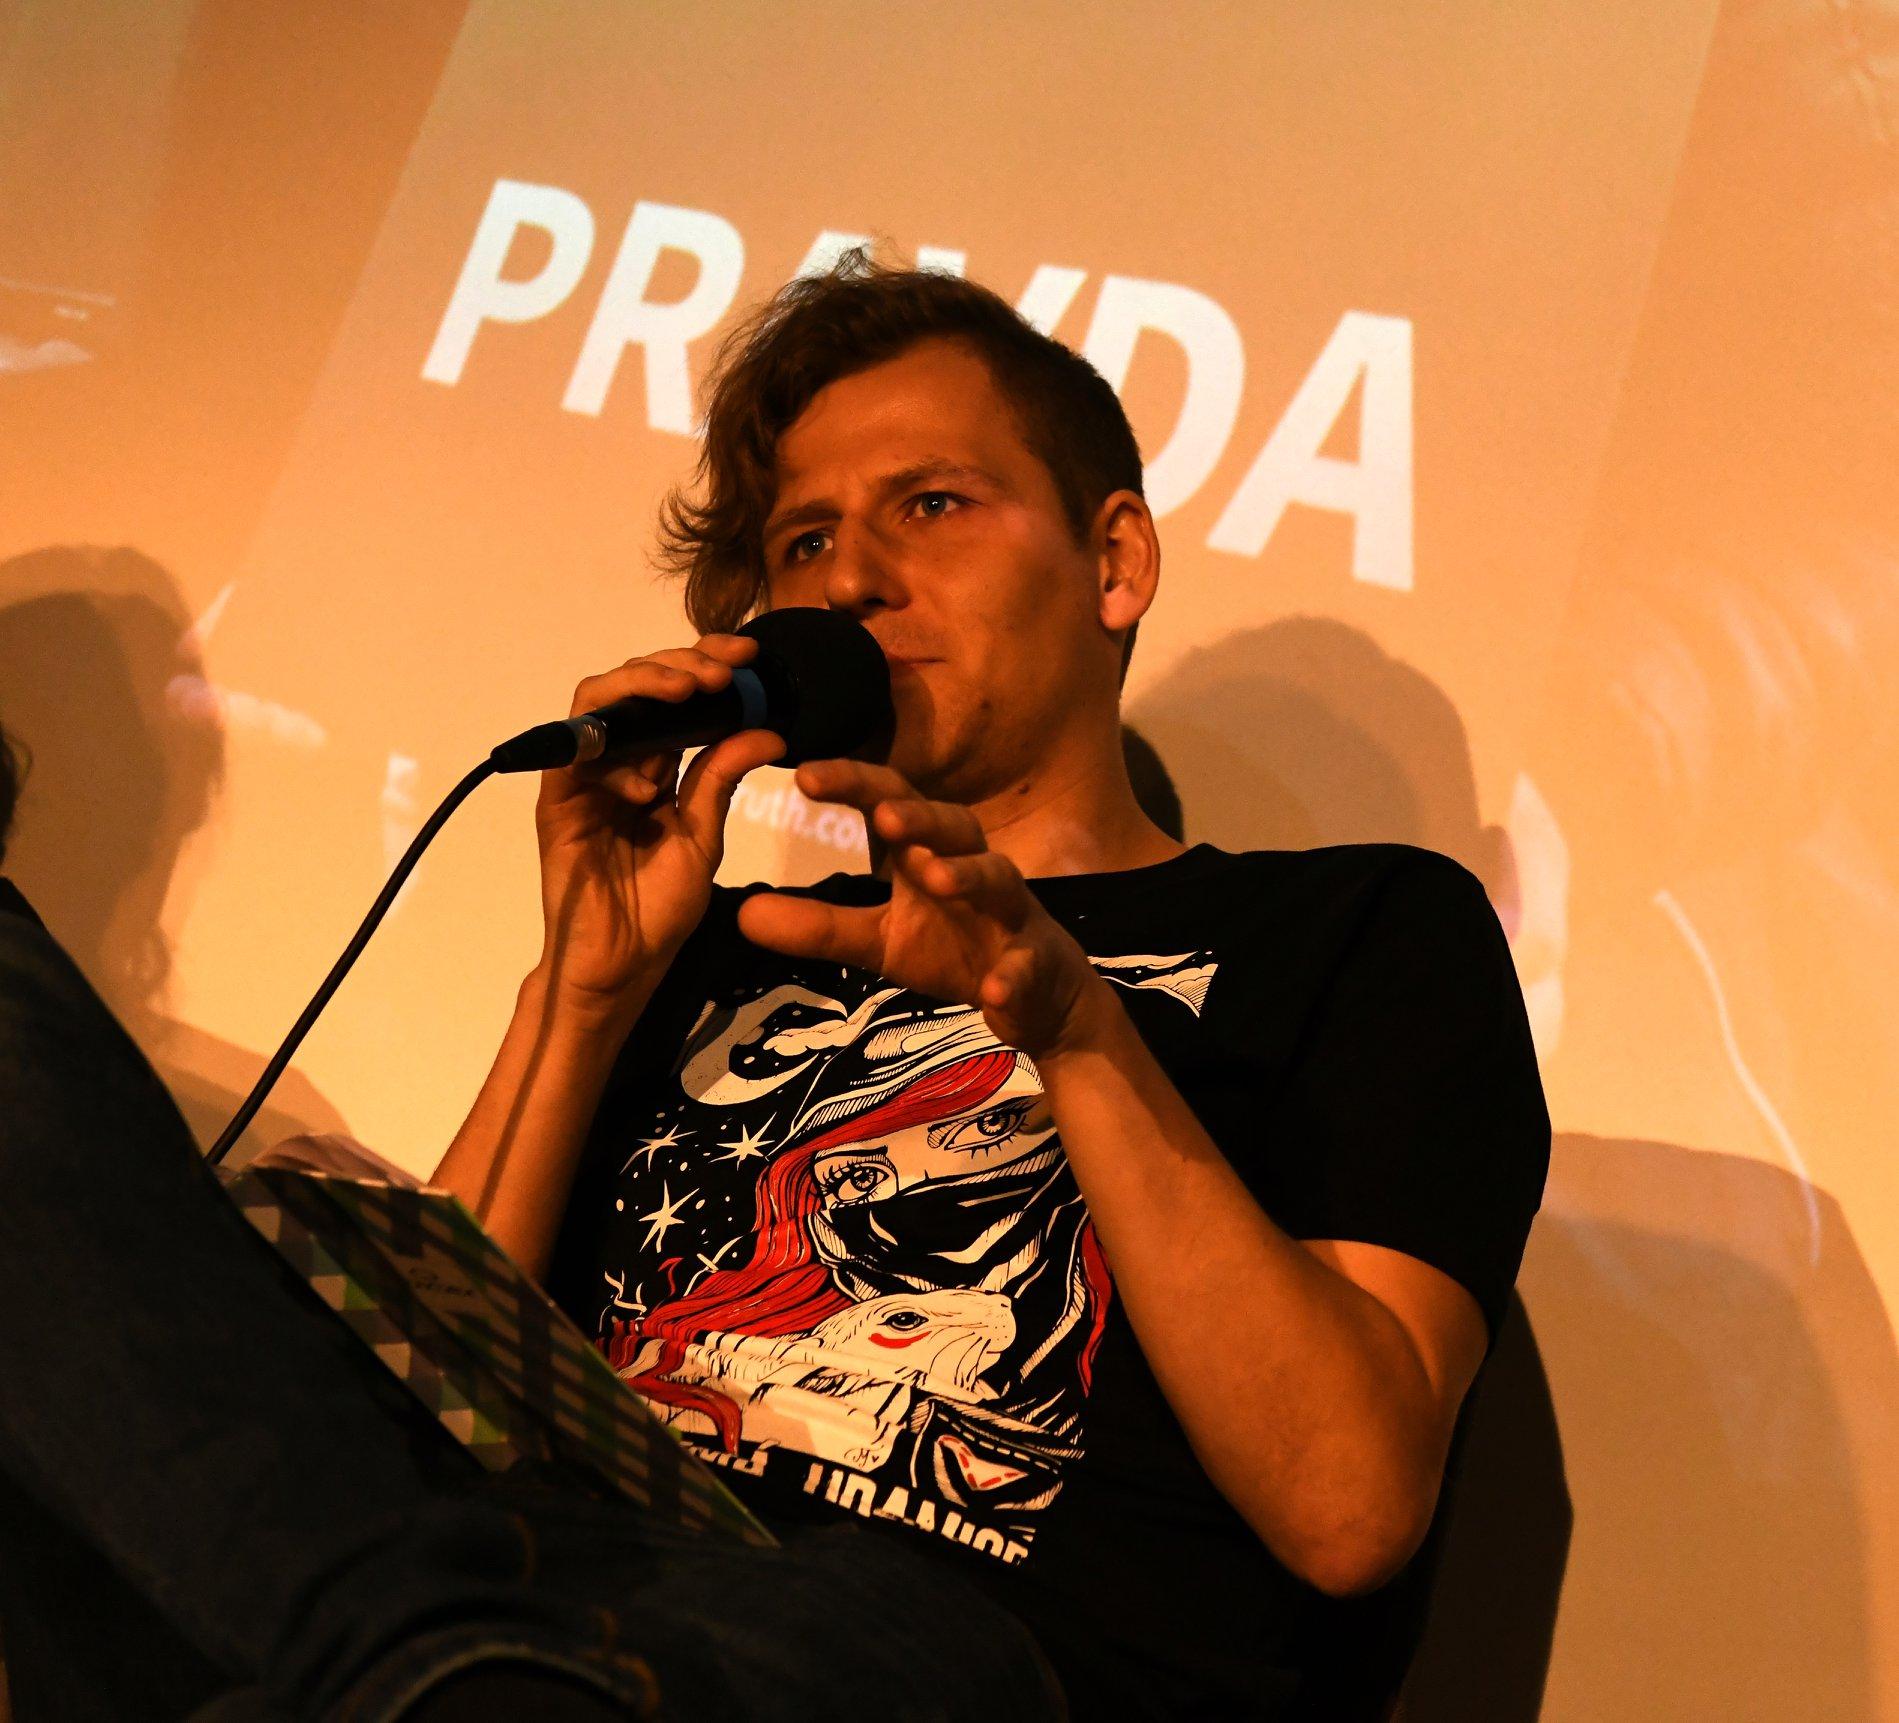 Jakub KPZ